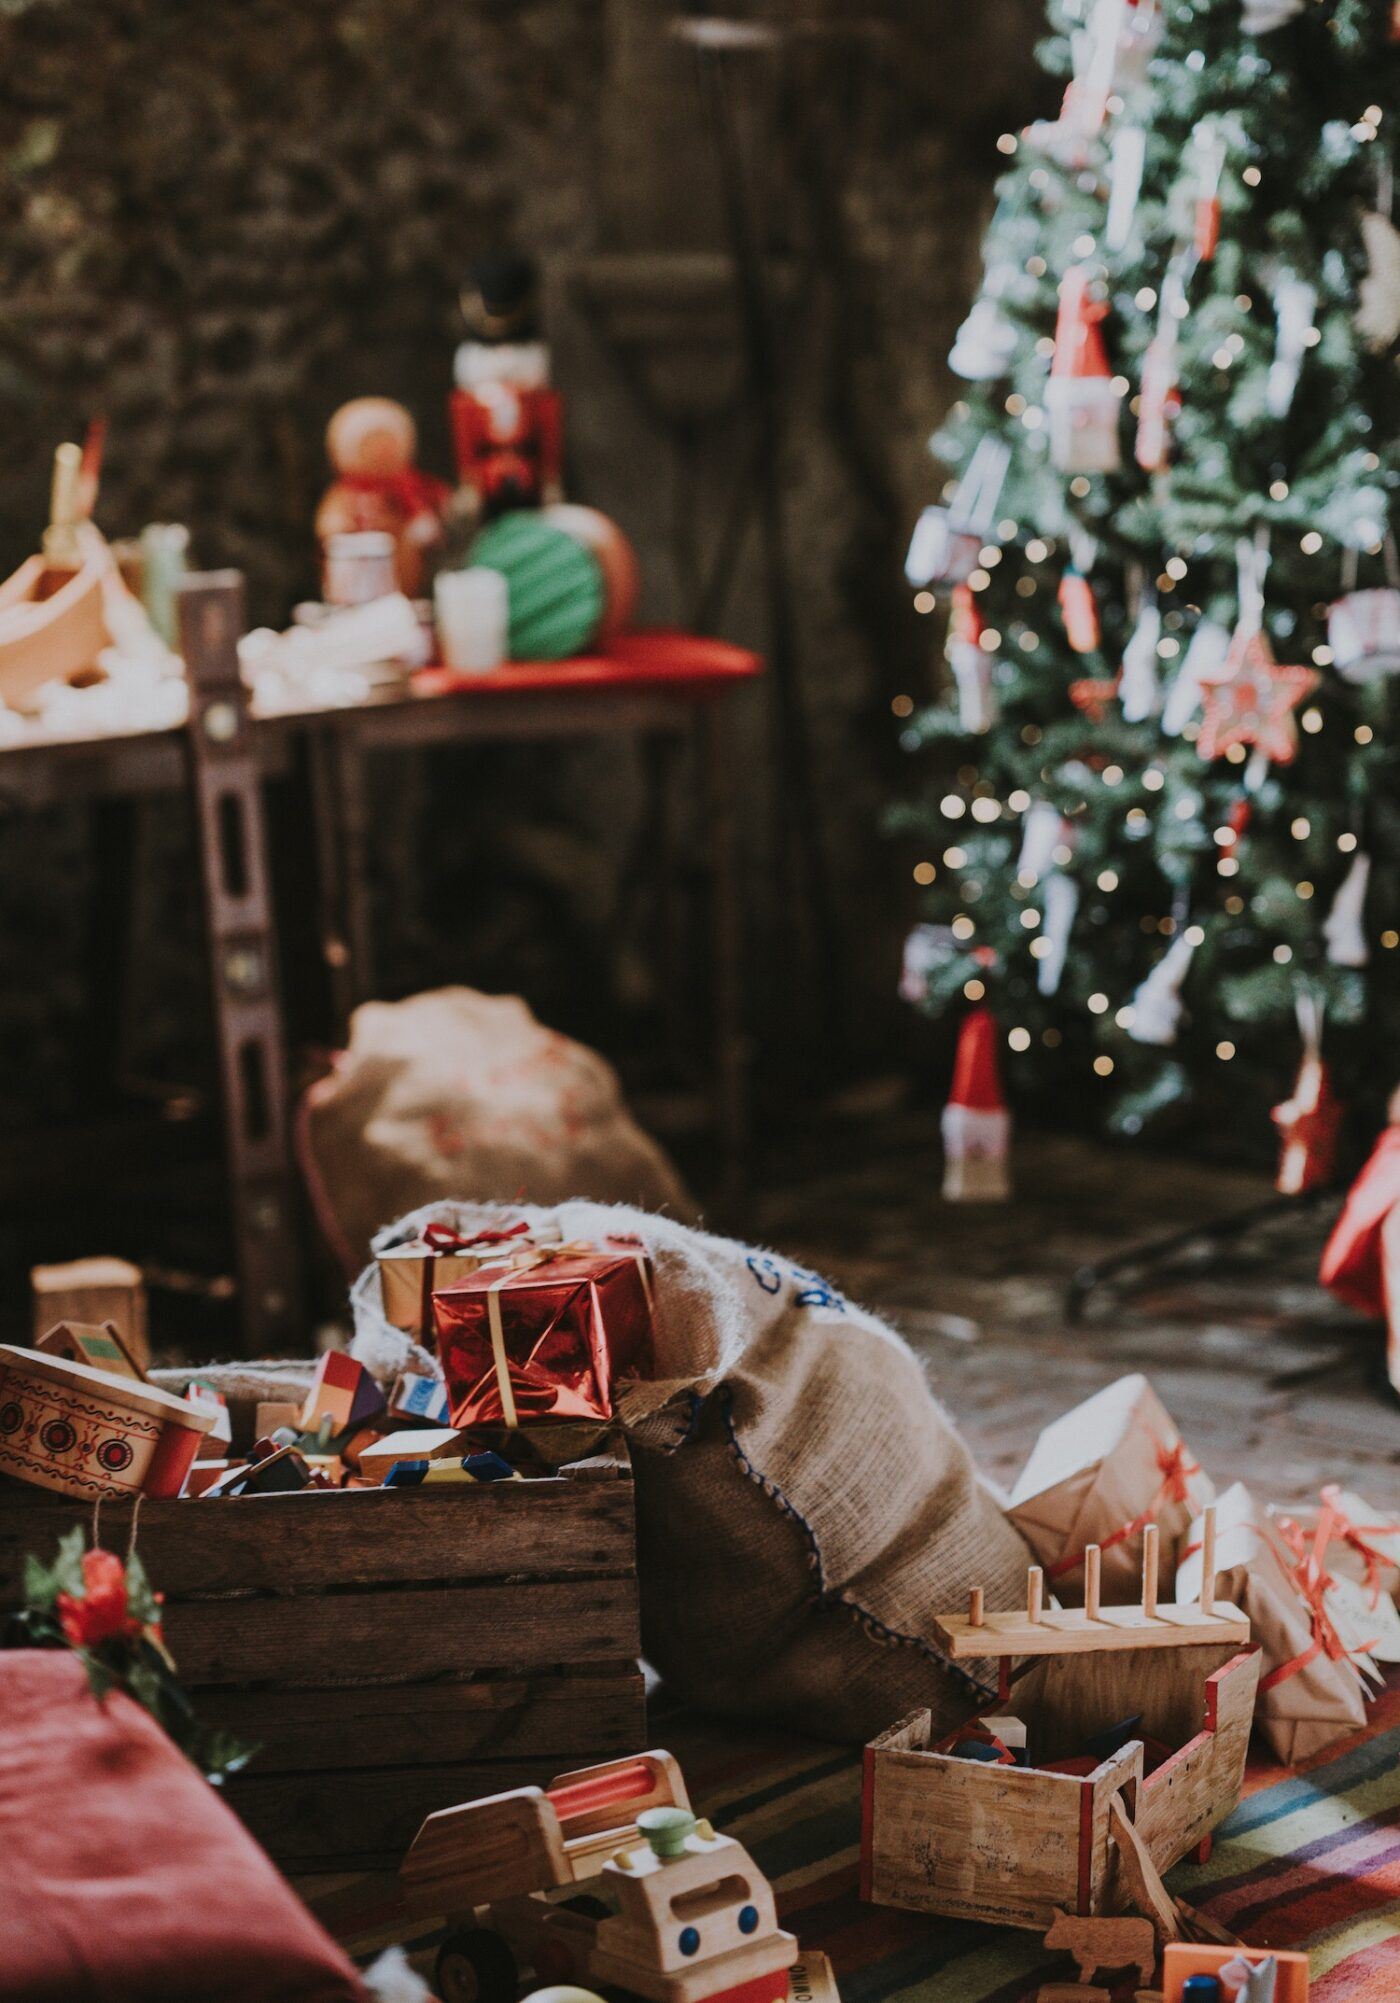 kerst cadeau inspiratie